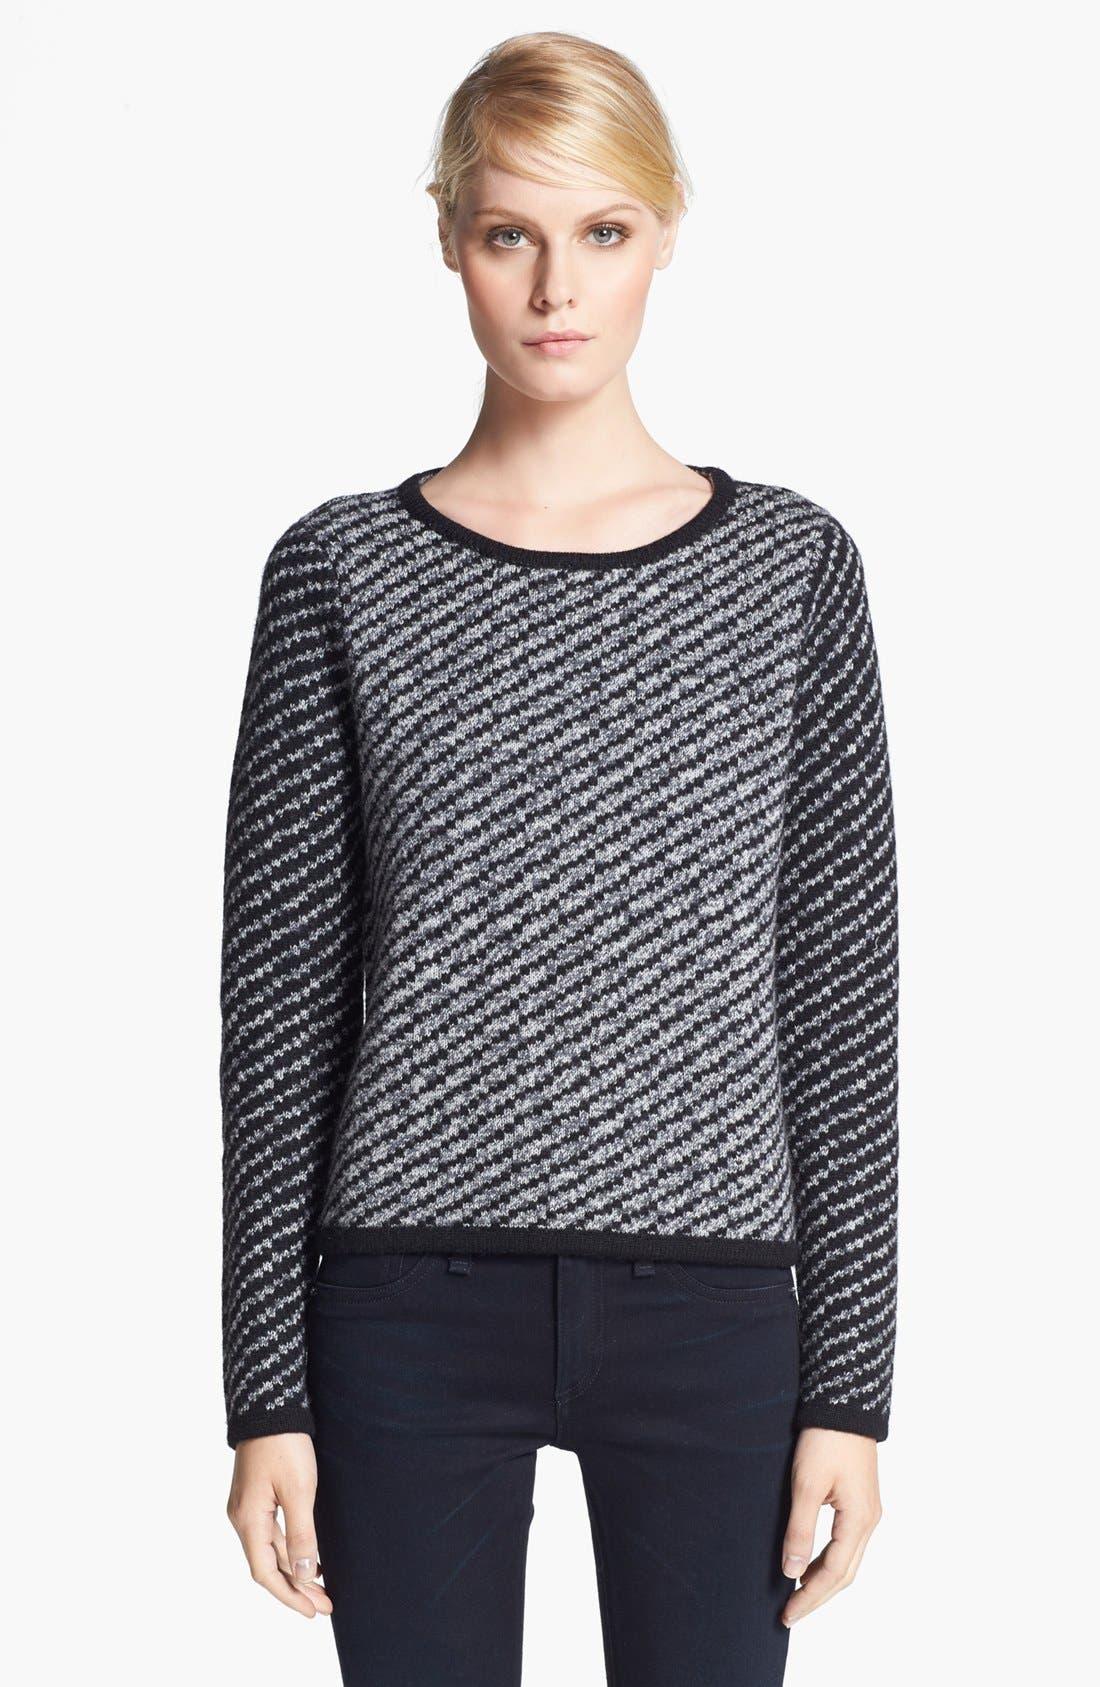 Main Image - rag & bone 'Ava' Sweater (Nordstrom Exclusive)